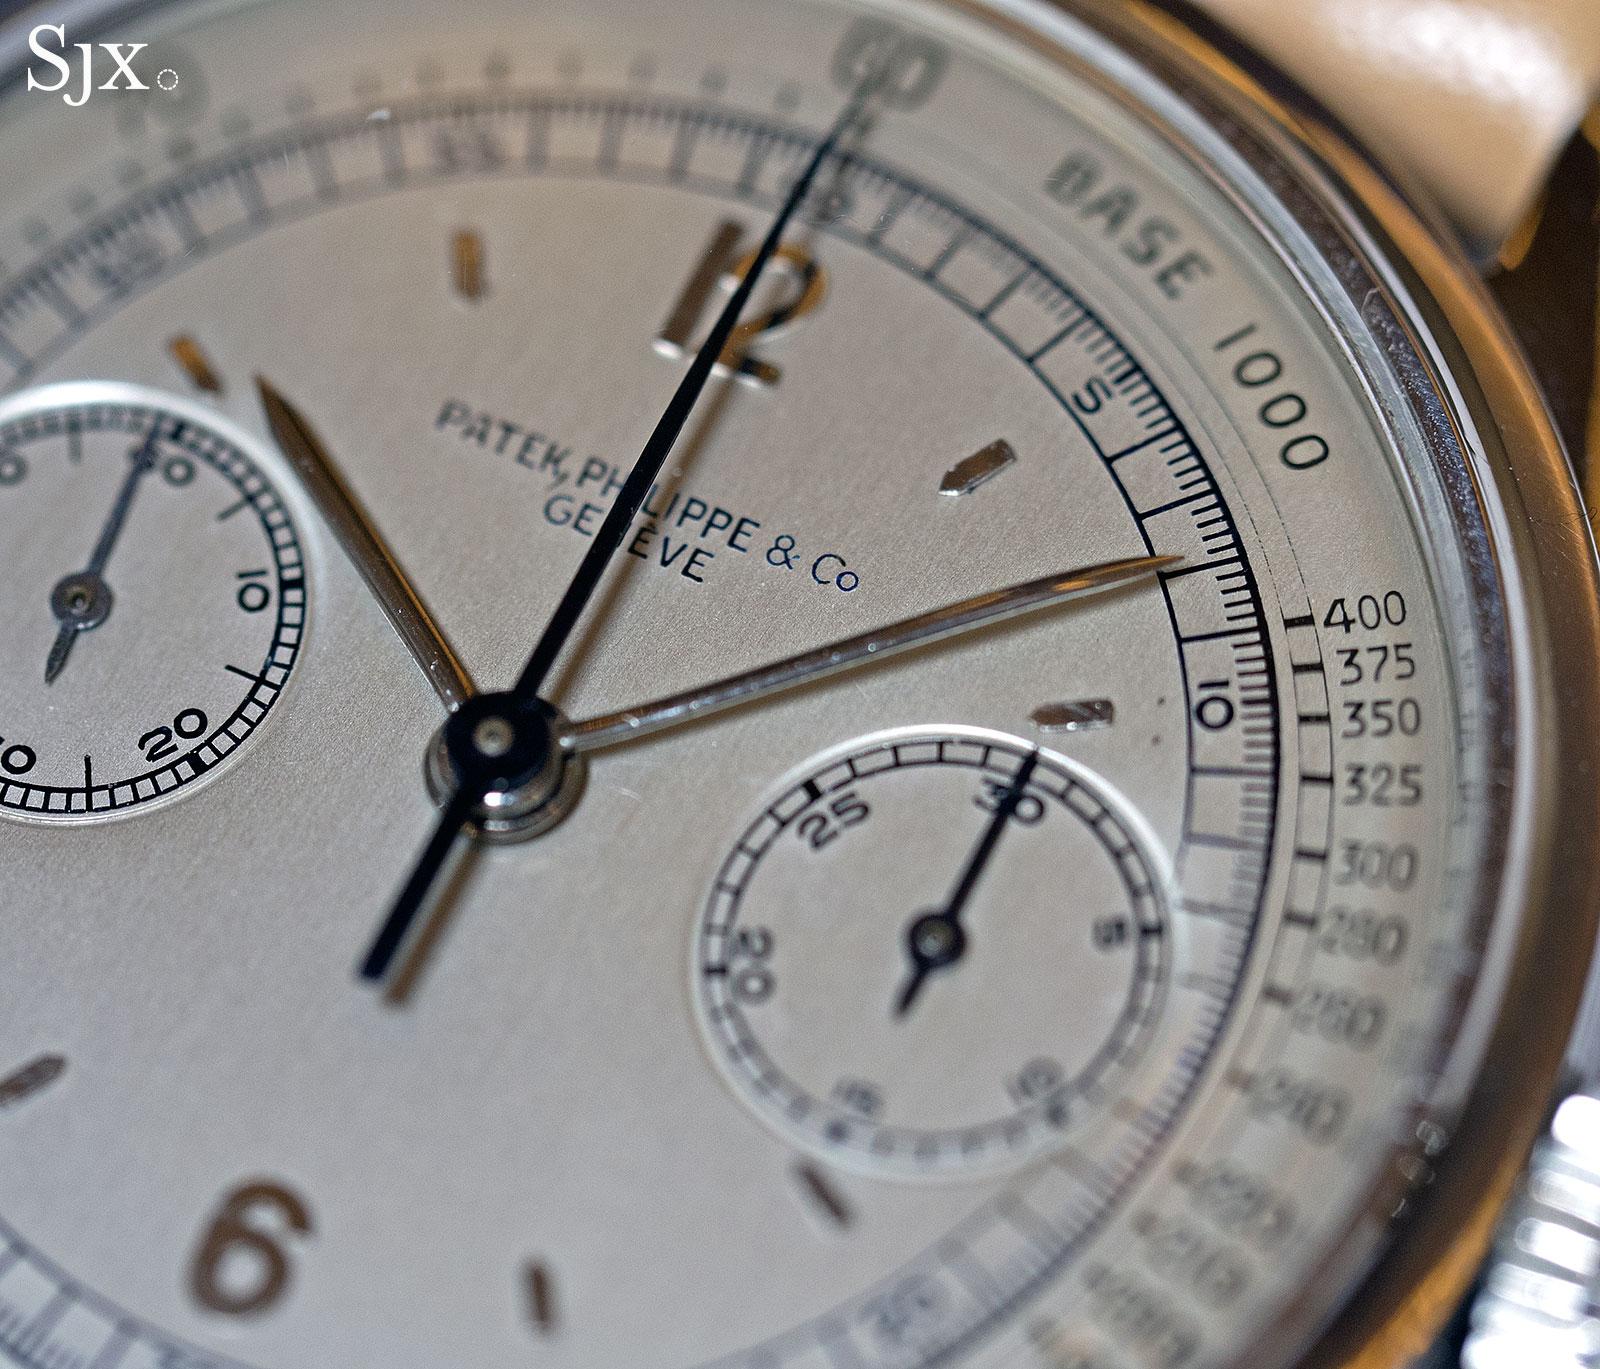 Patek Philippe 530 chronograph steel 2